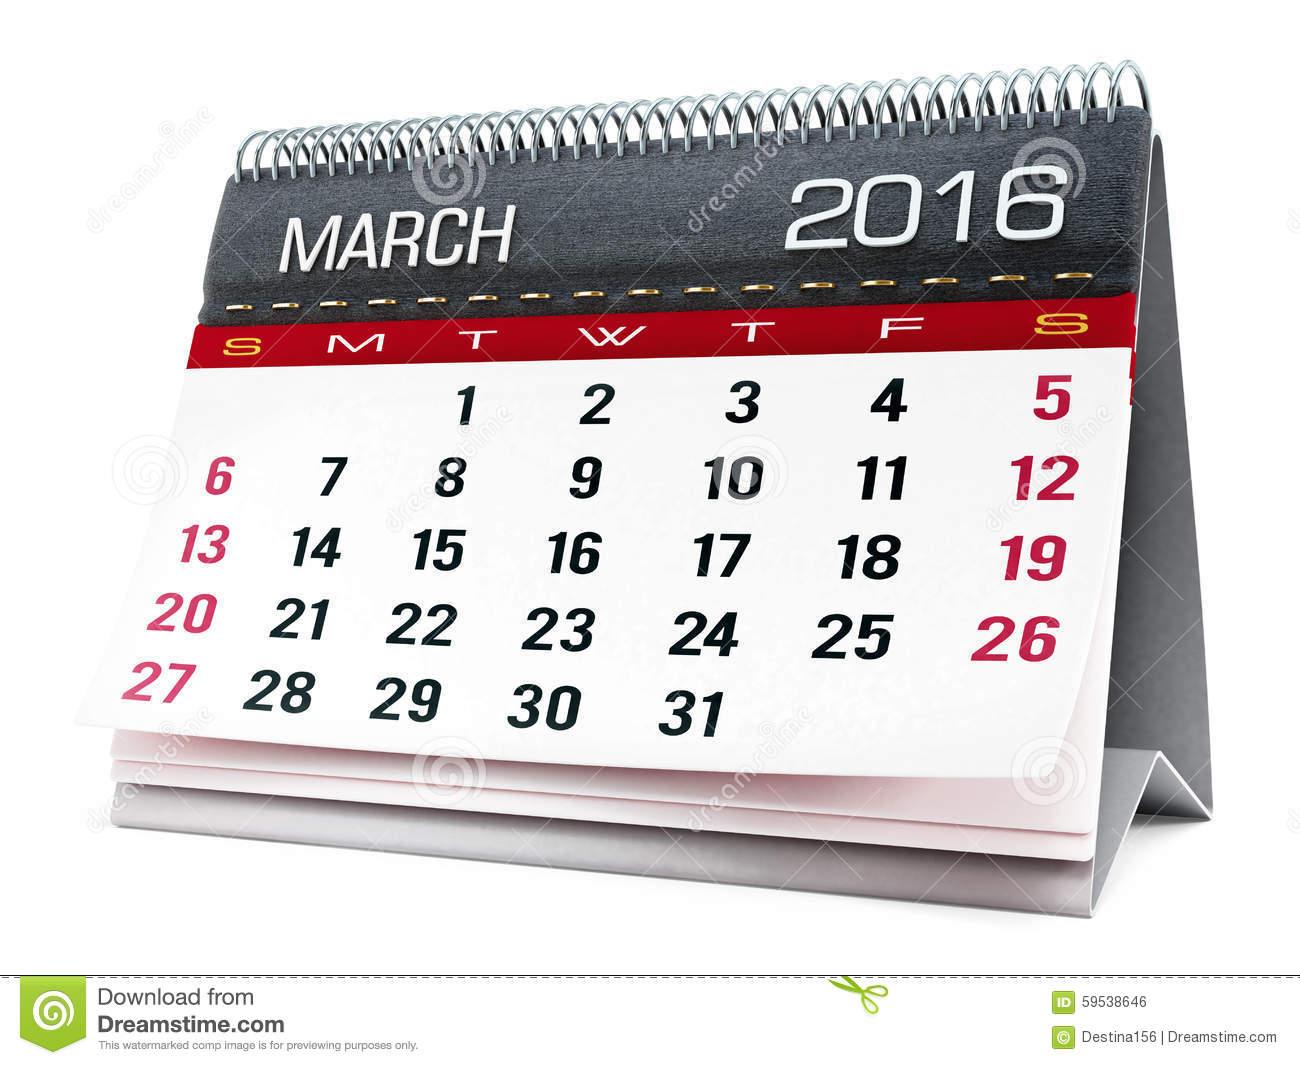 June calendar 2016 clipart graphic black and white stock March calendar 2016 clipart - ClipartFest graphic black and white stock